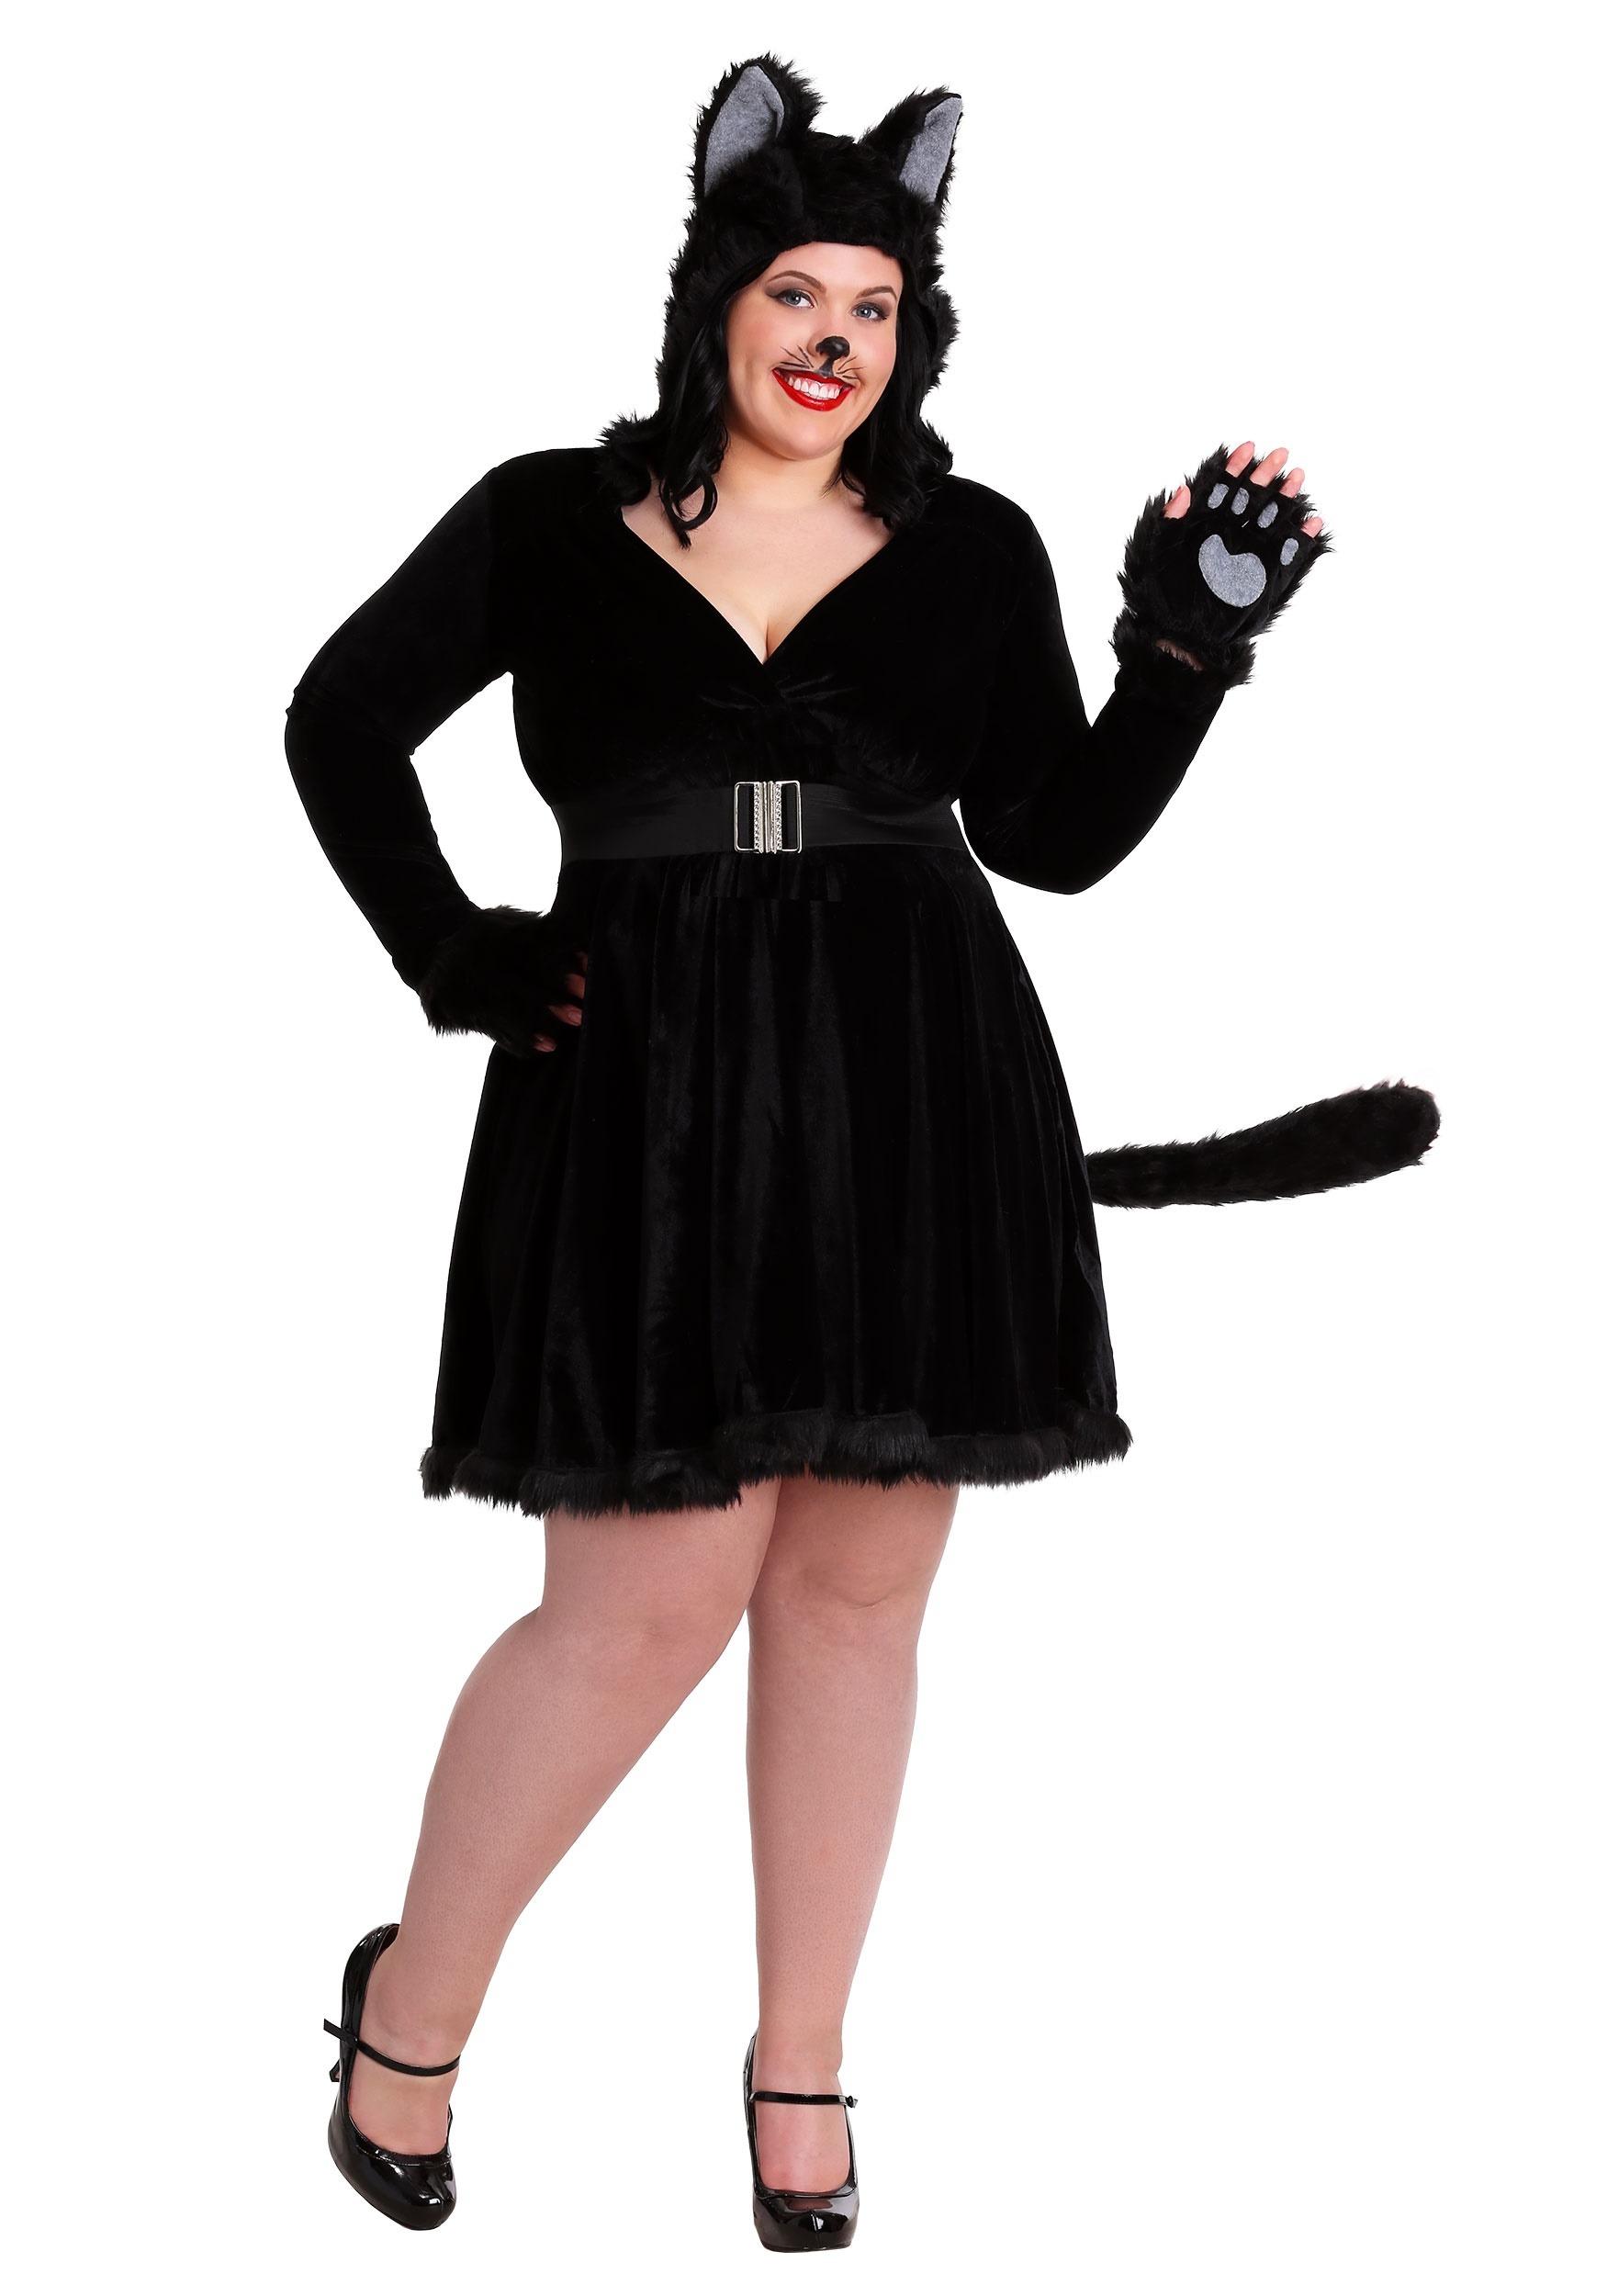 Black Cat Plus Size Costume for Women